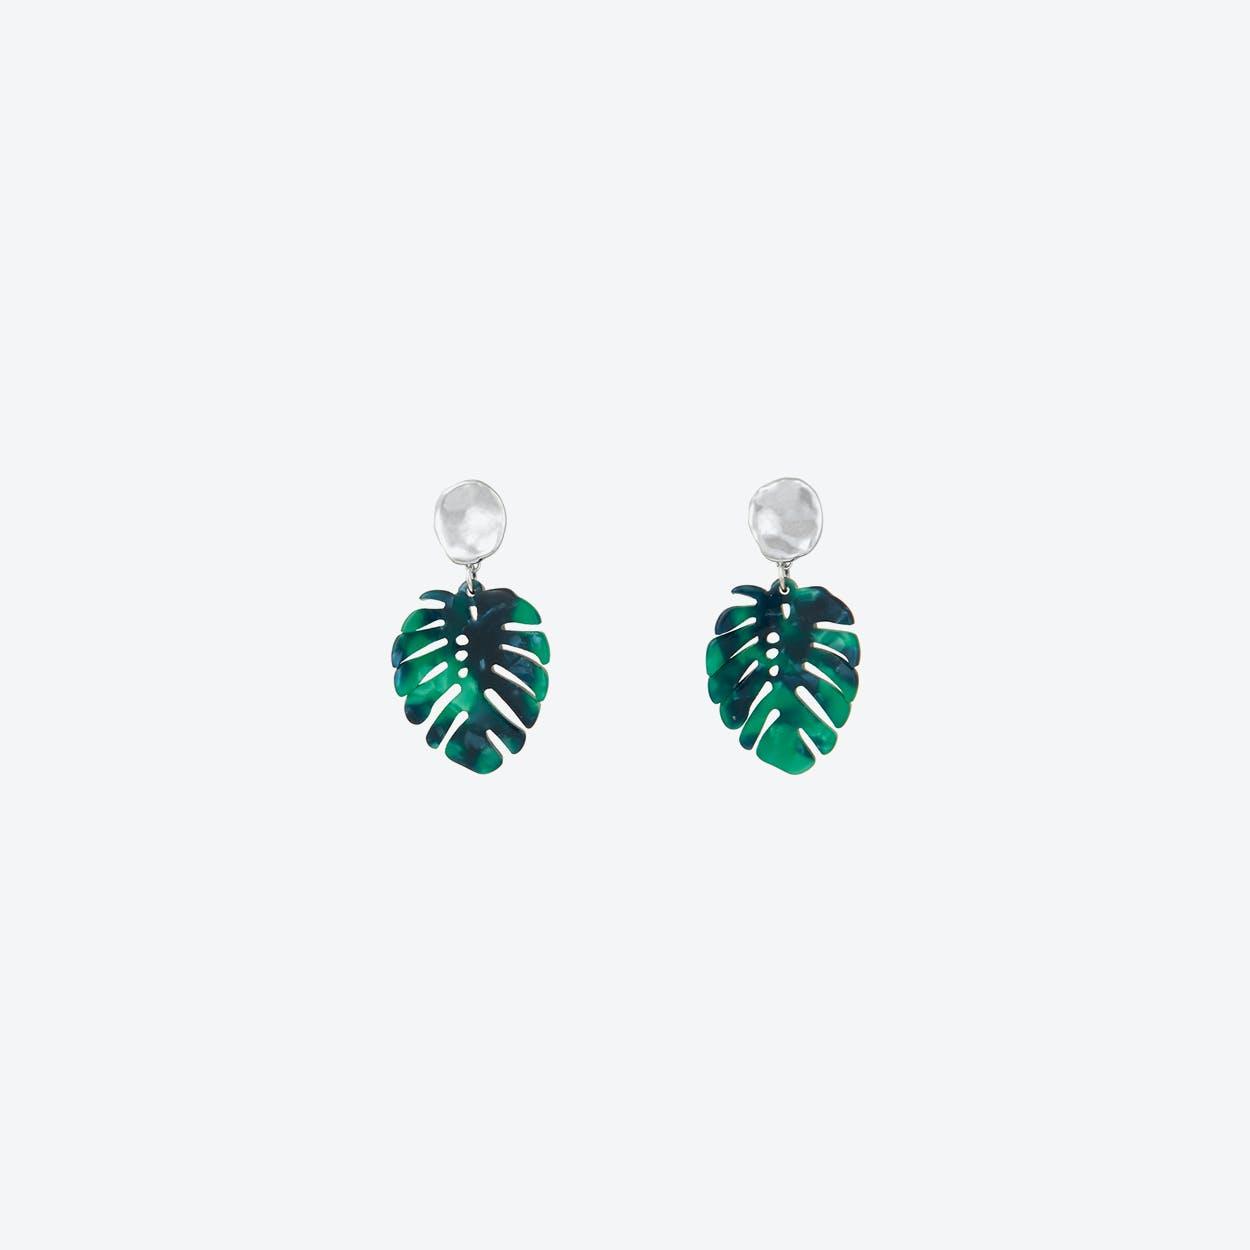 White Gold Leaf Drop Earrings